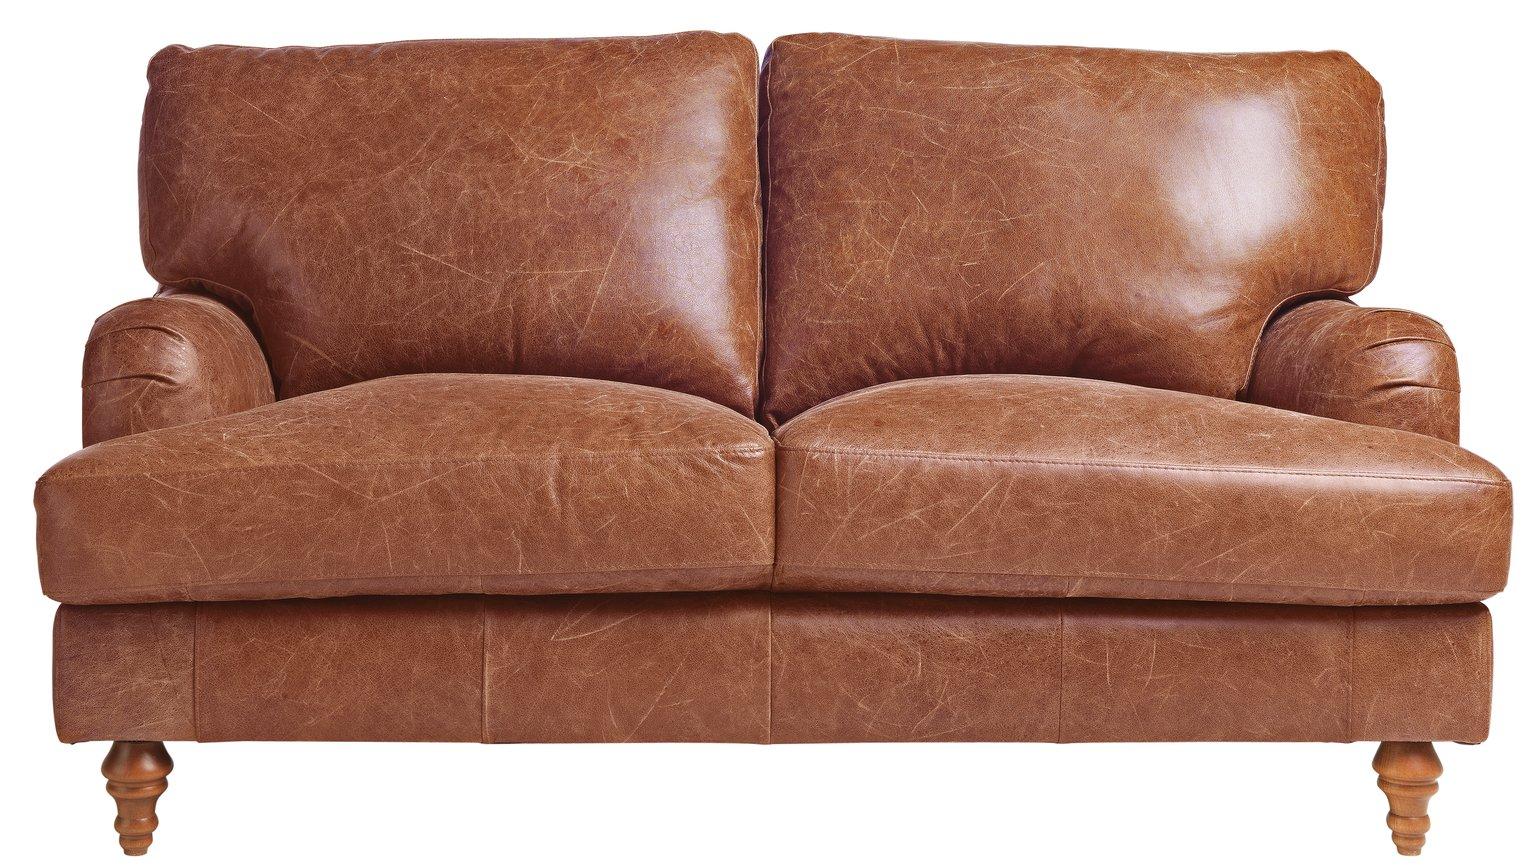 heart of house livingston 2 seater leather sofa tan